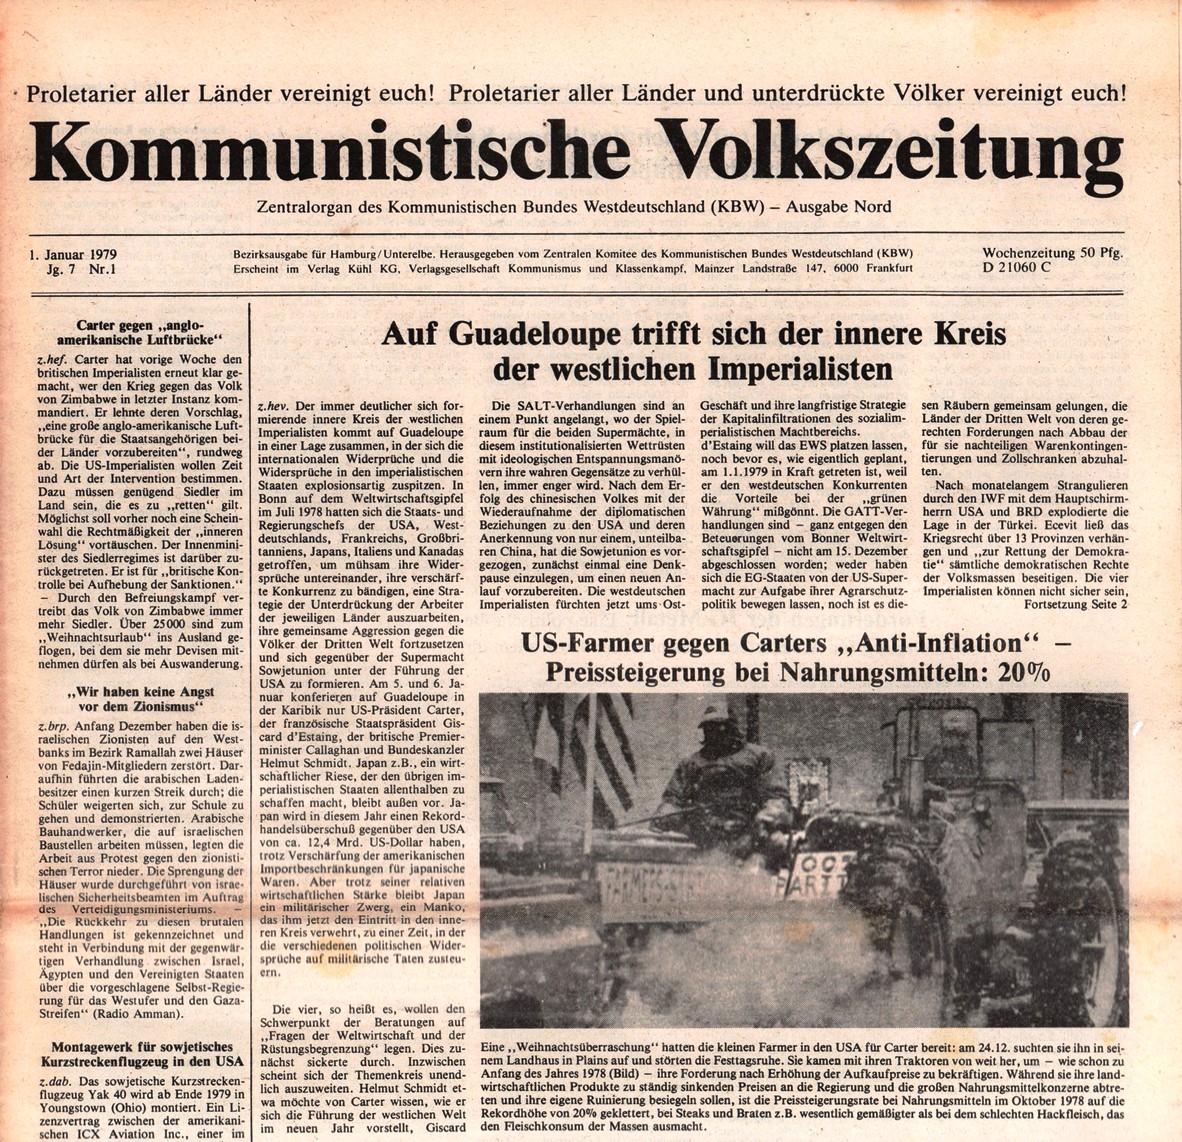 Hamburg_KVZ_1979_01_01